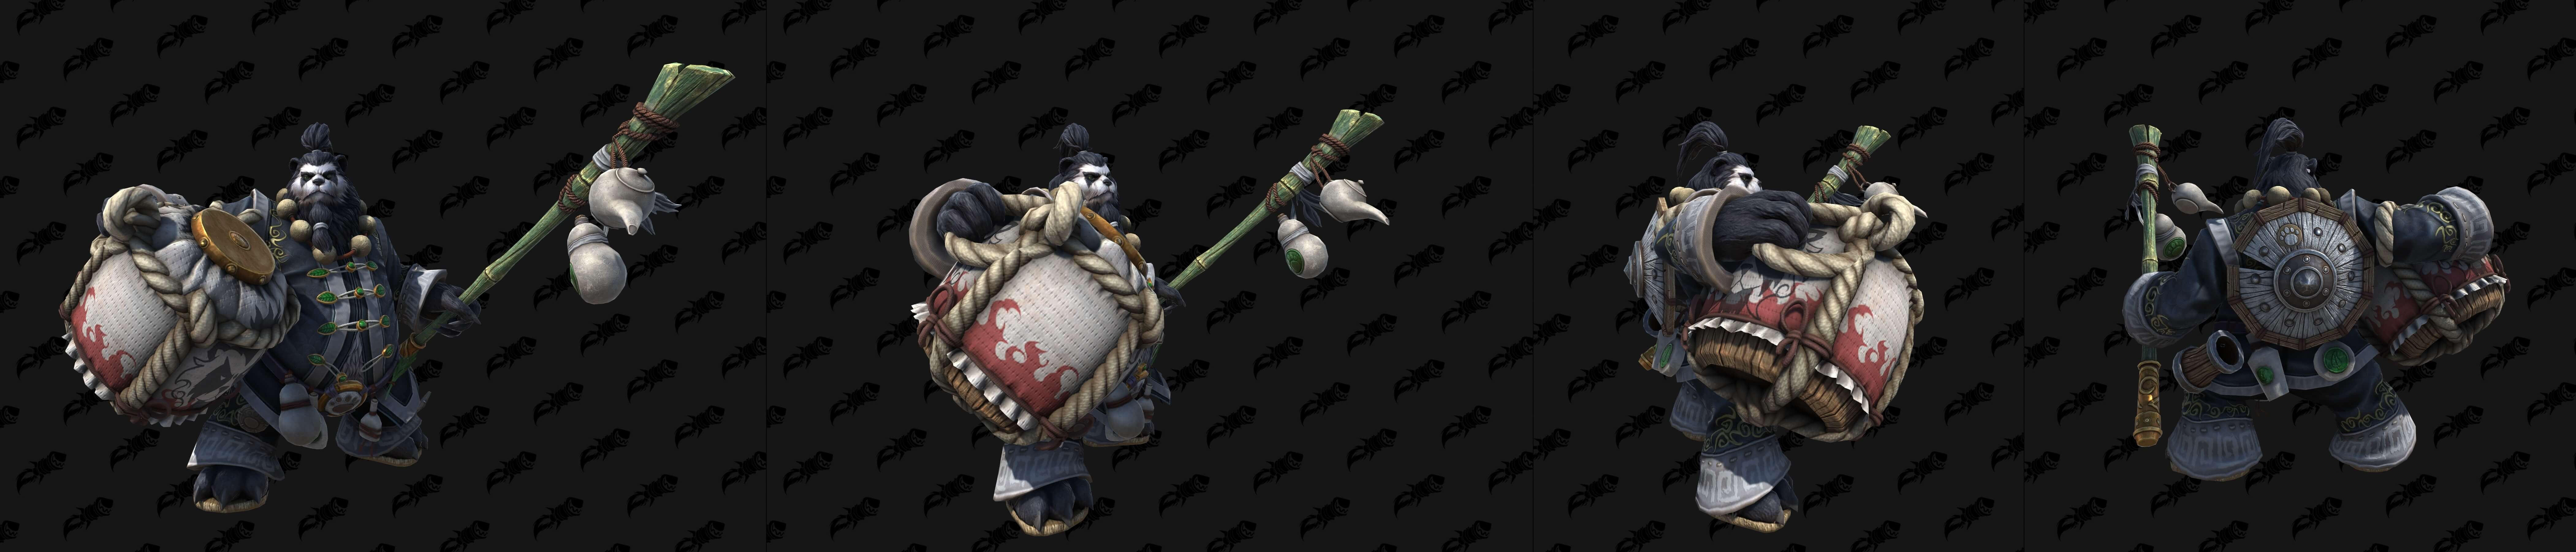 Чэнь Буйный Портер Warcraft lll: Reforged